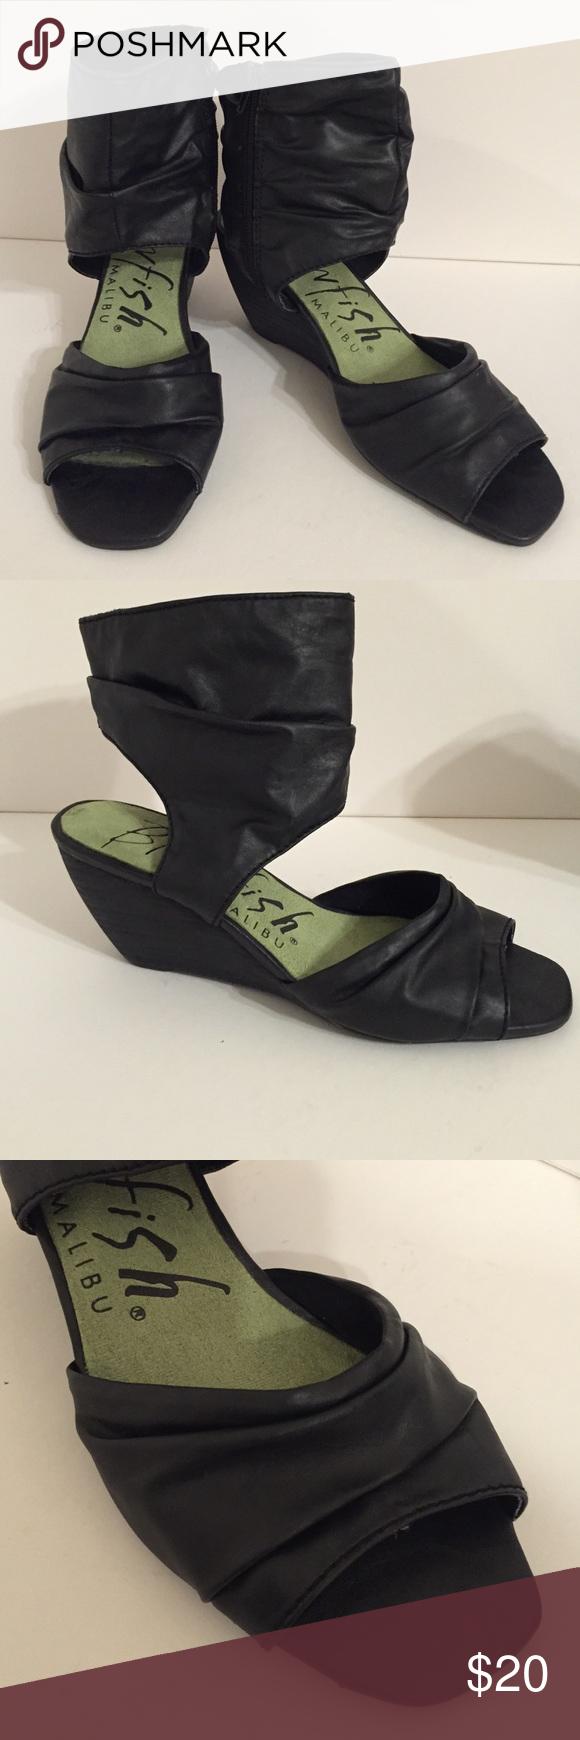 Black enclosed sandals - Blowfish Malibu Black Covered Wedged Sandals